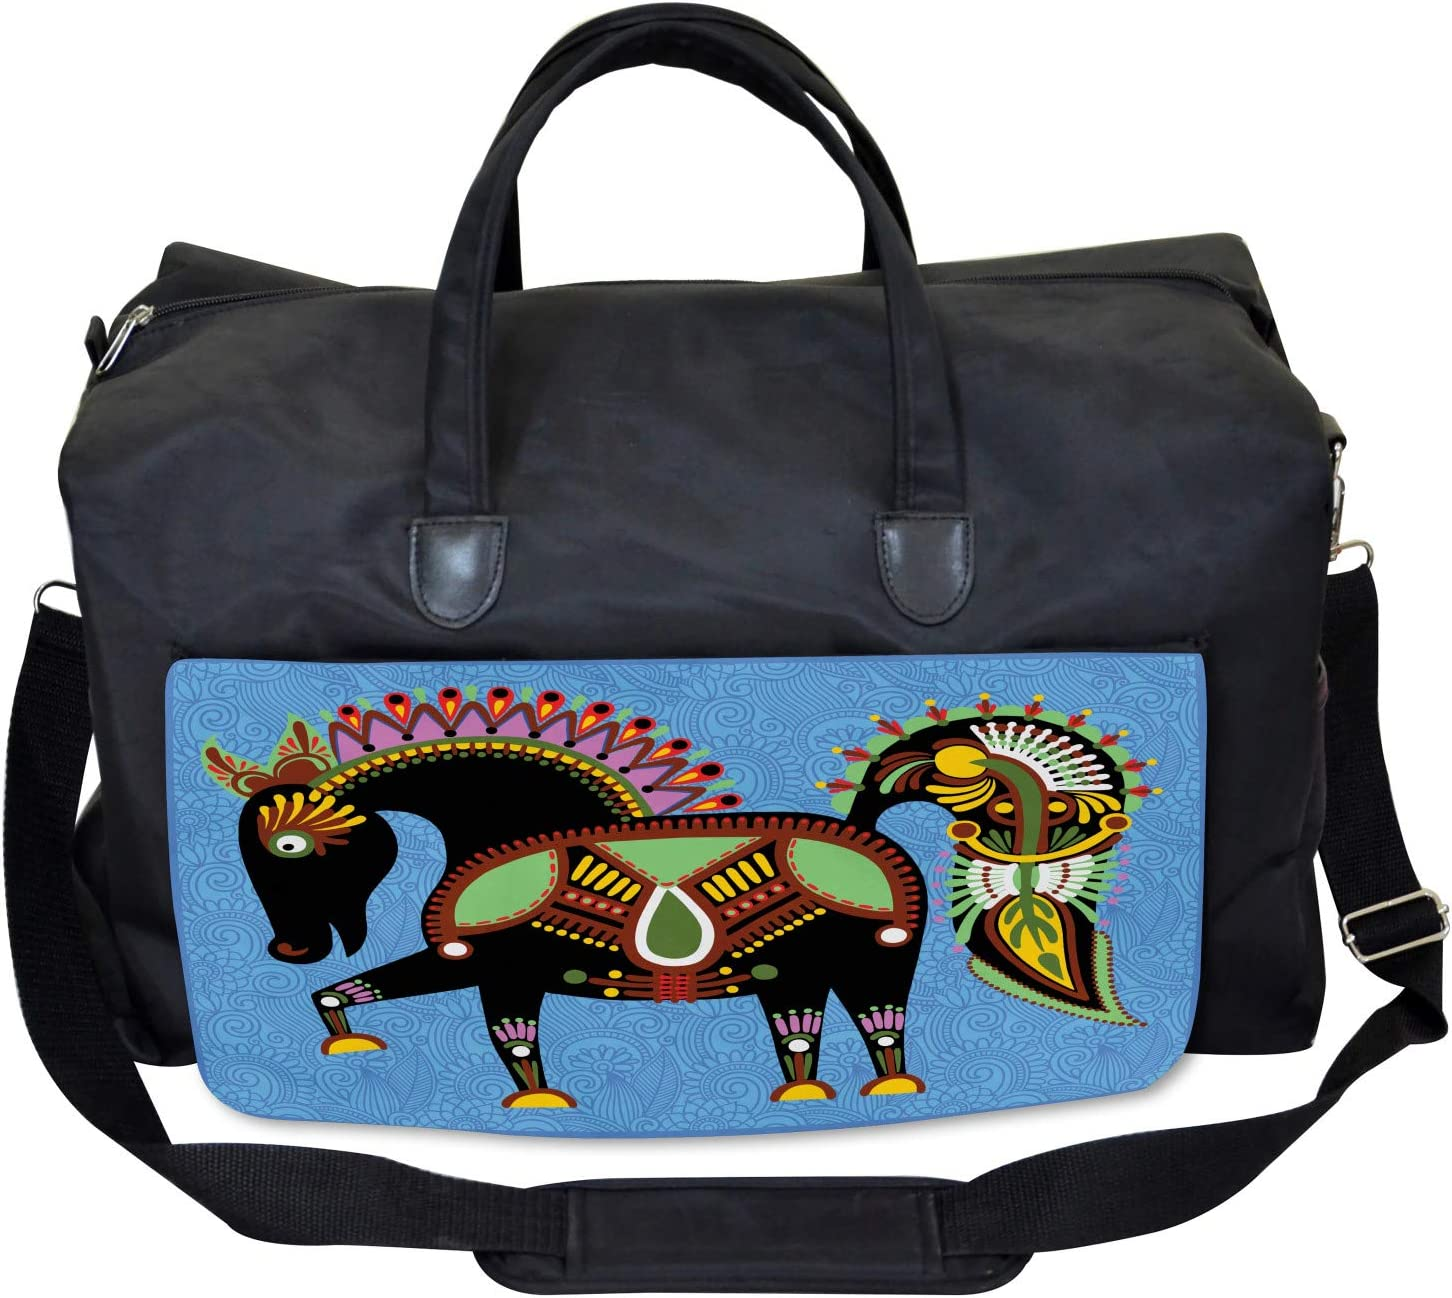 Large Weekender Carry-on Folkloric Animal Figure Ambesonne Ethnic Gym Bag